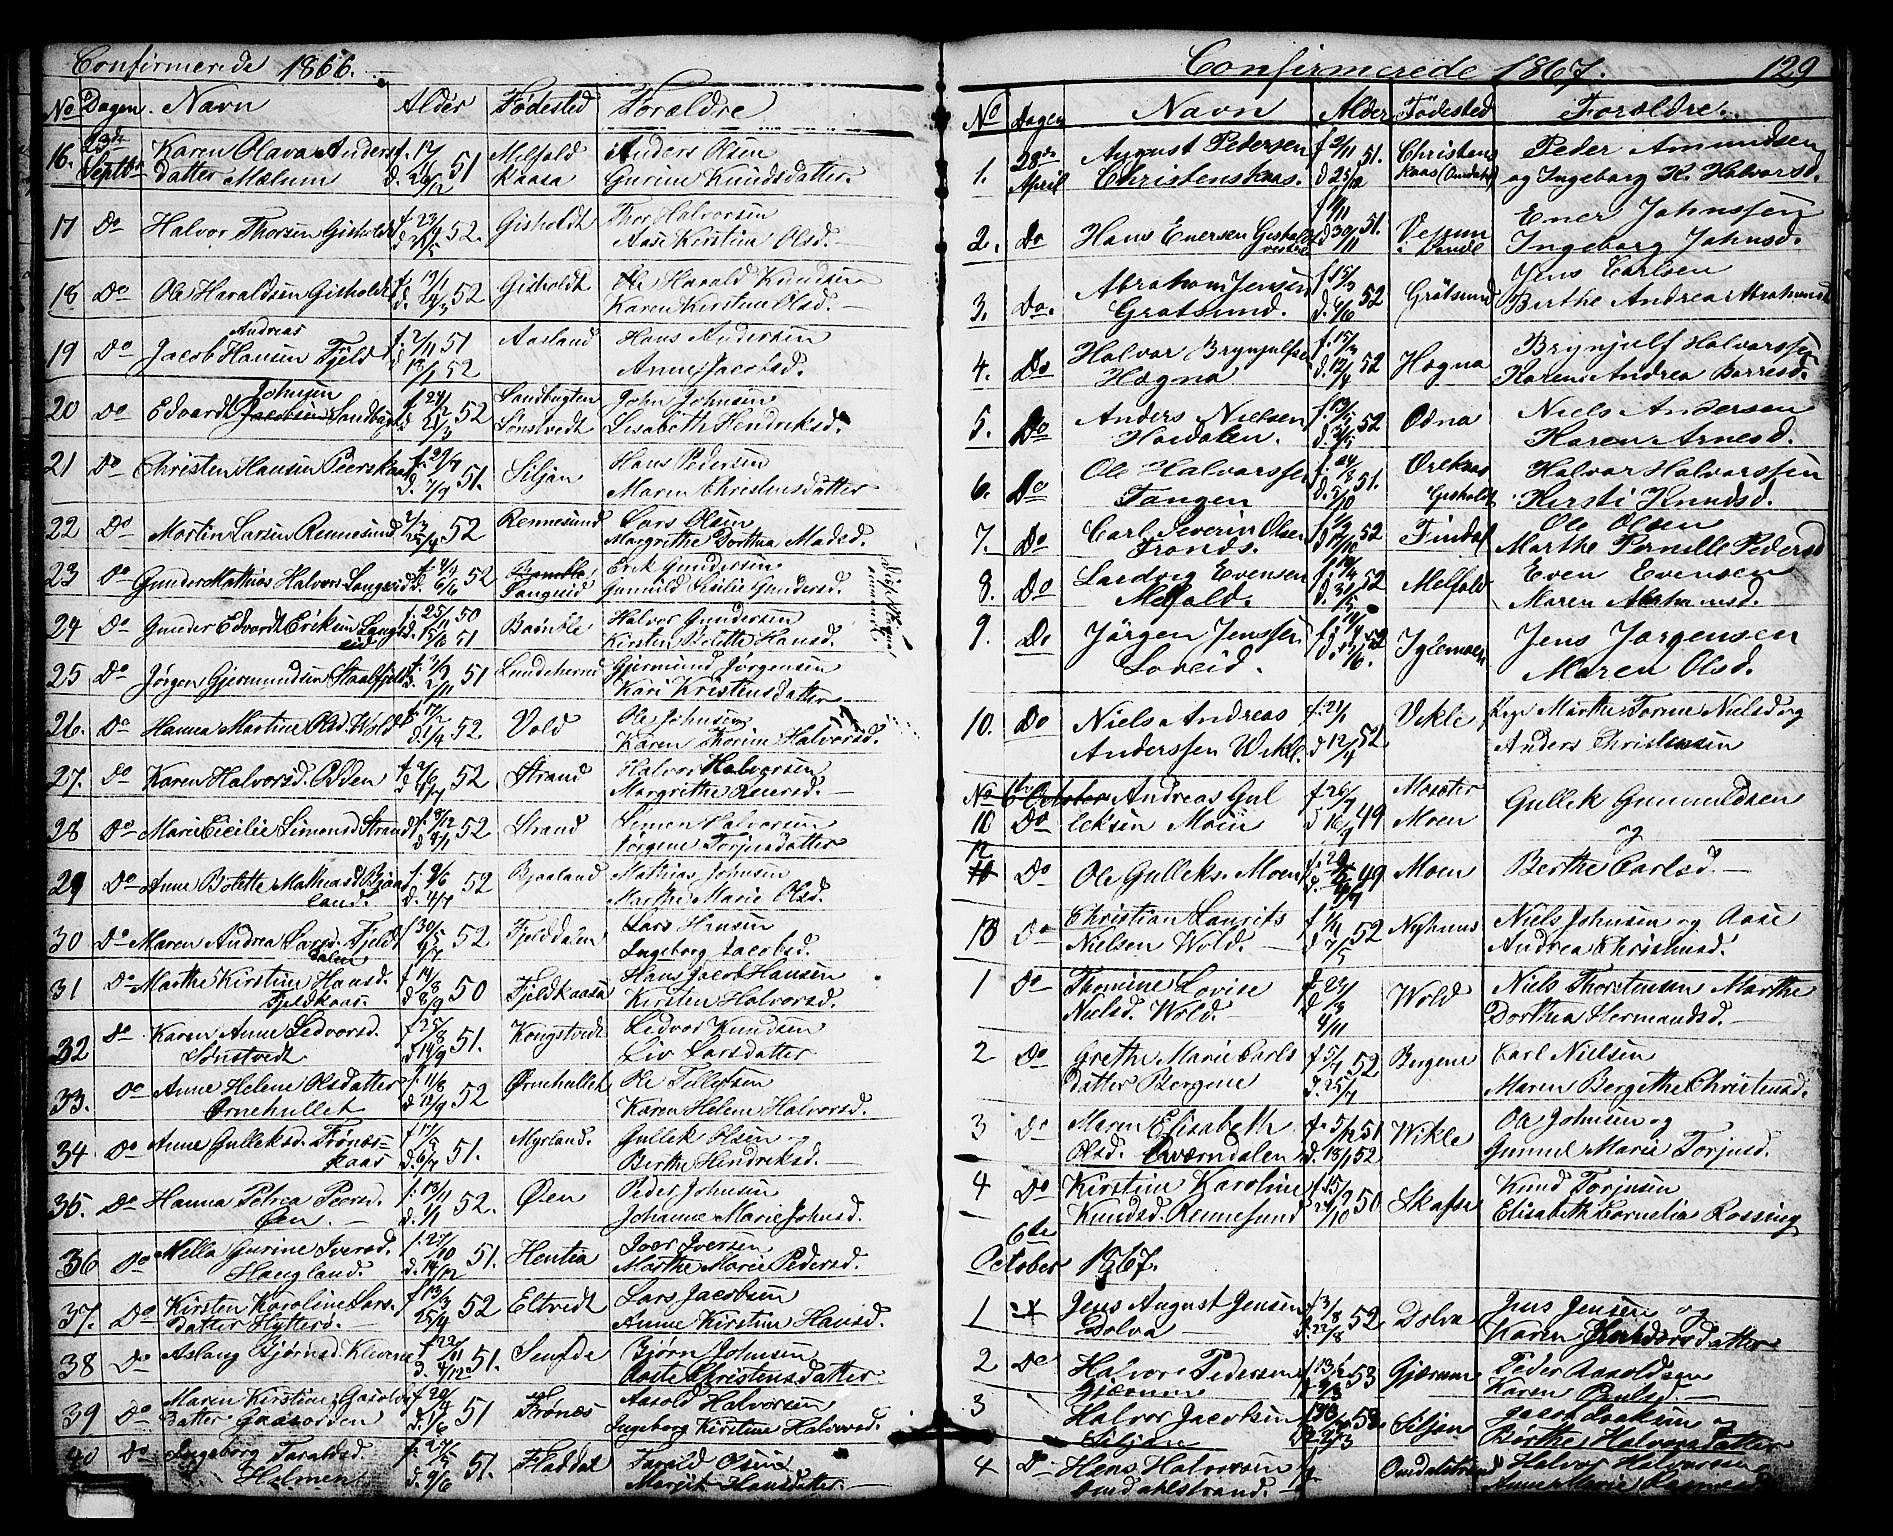 SAKO, Solum kirkebøker, G/Gb/L0002: Klokkerbok nr. II 2, 1859-1879, s. 129